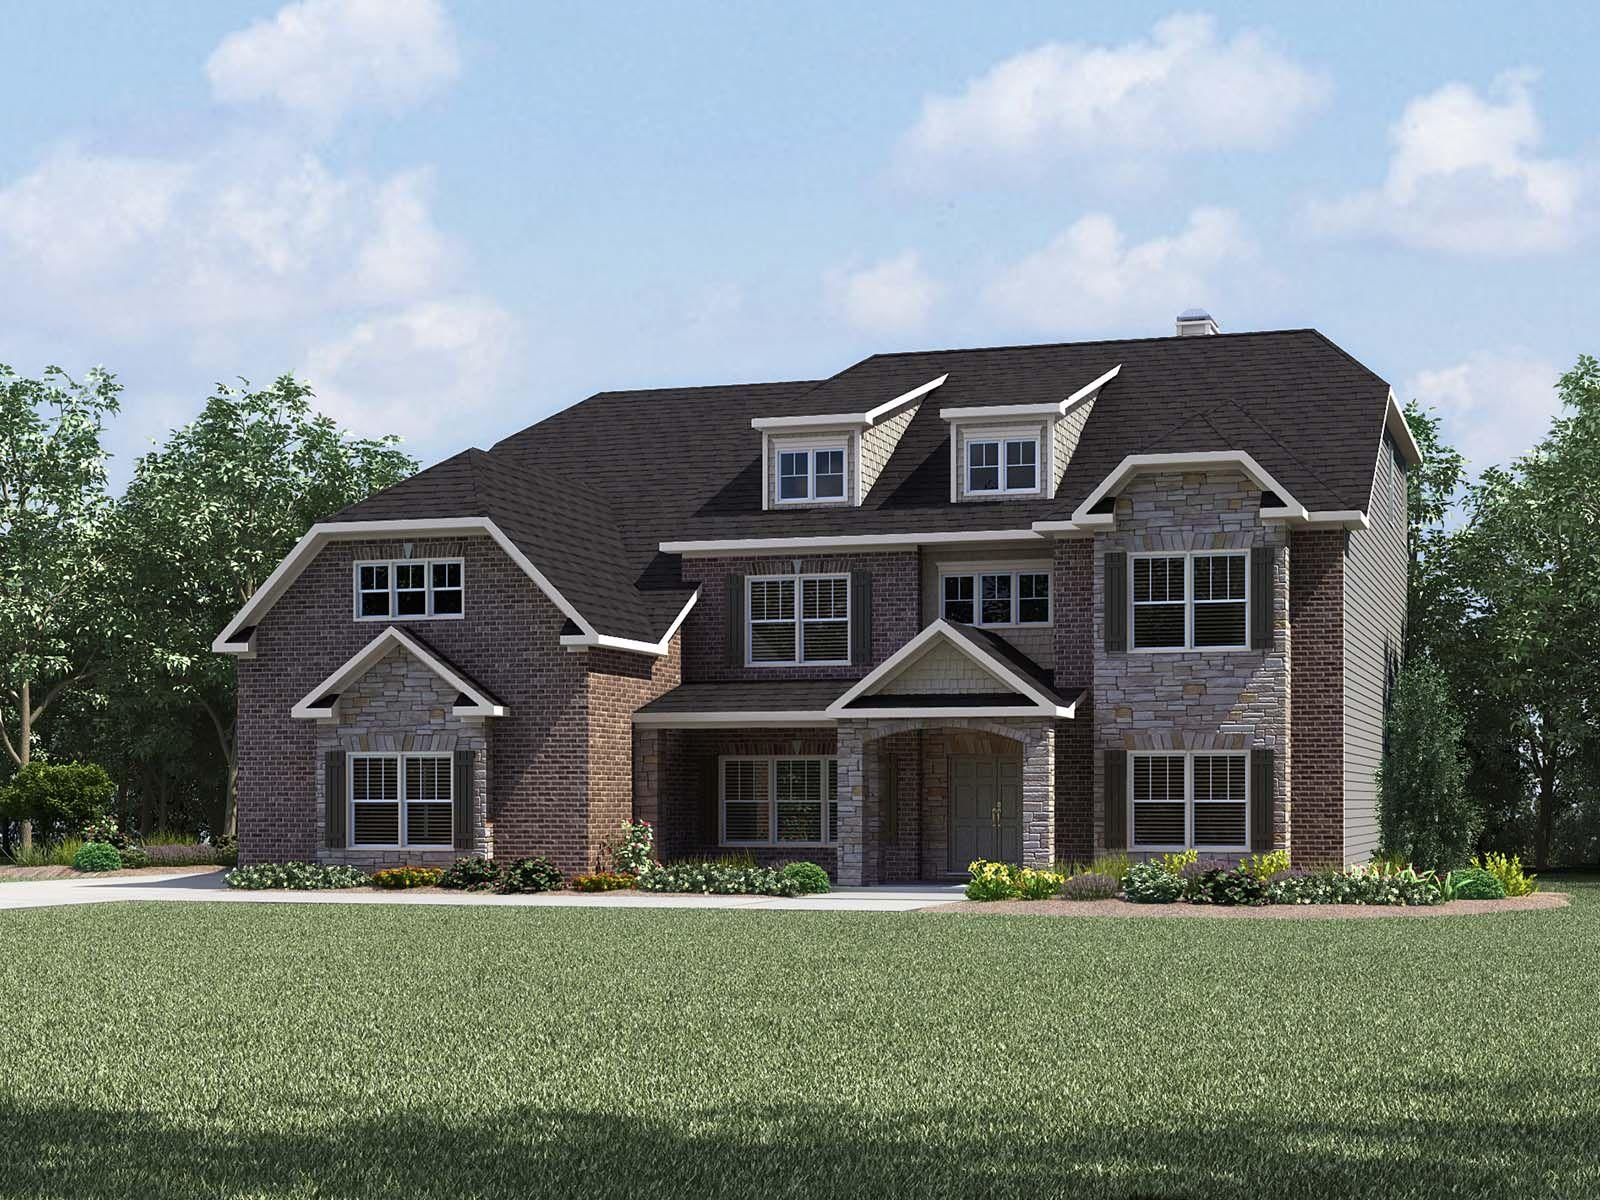 Single Family for Sale at Roxbury 423 Coleridge Lane Greer, South Carolina 29651 United States